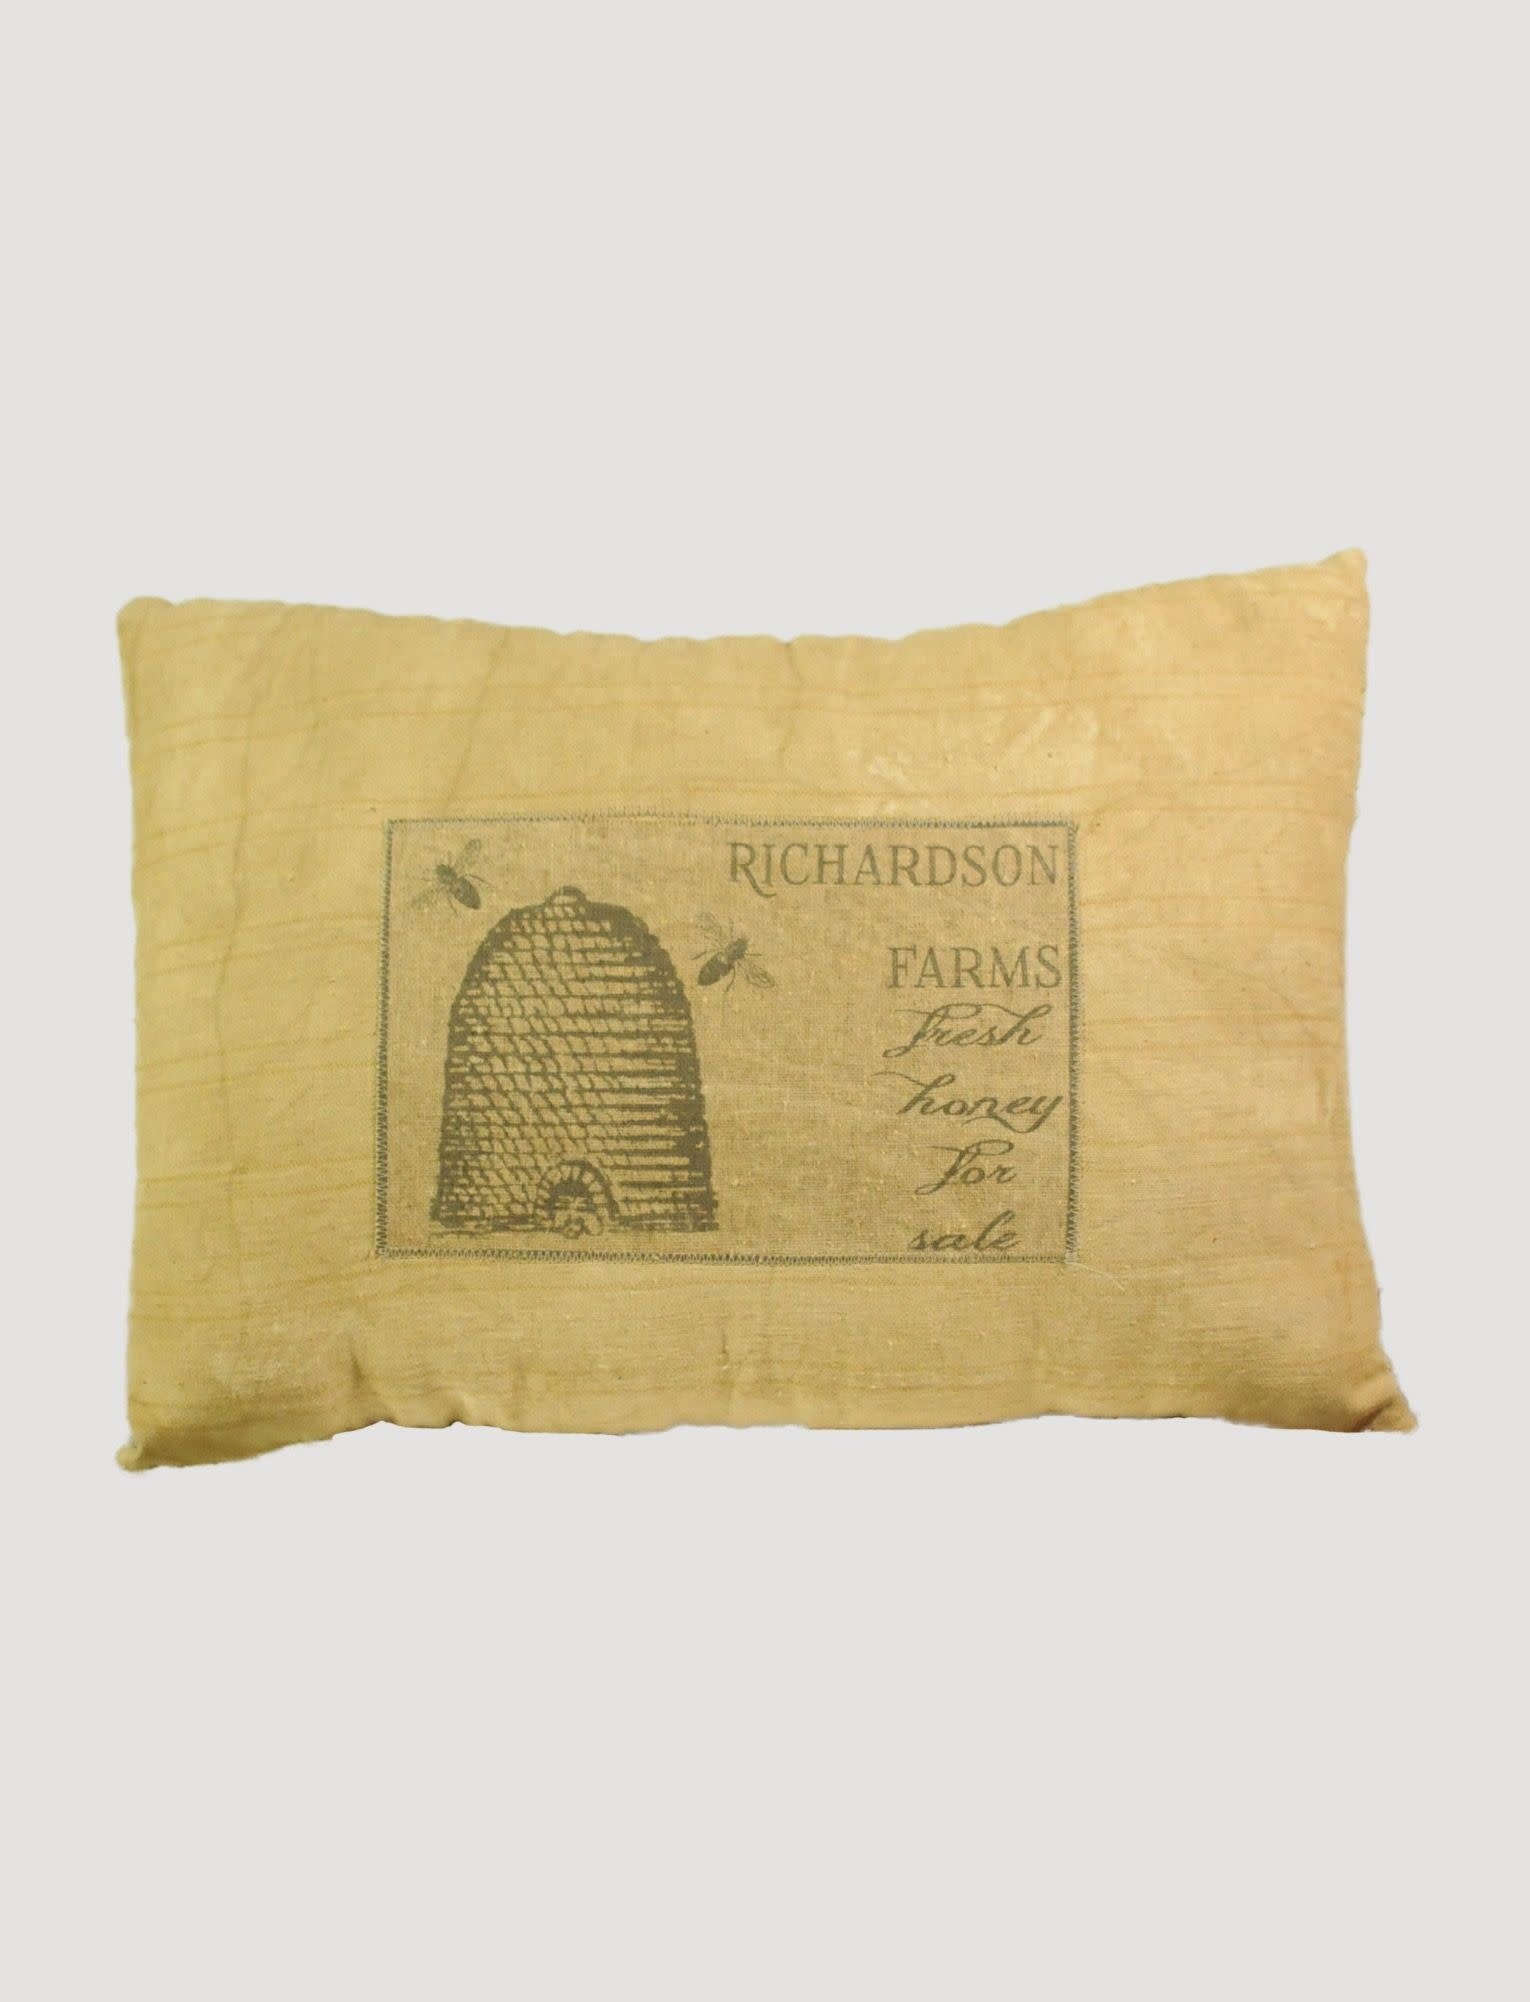 Nana's Farmhouse Handmade Richardson Farms Fresh Honey For Sale Pillow